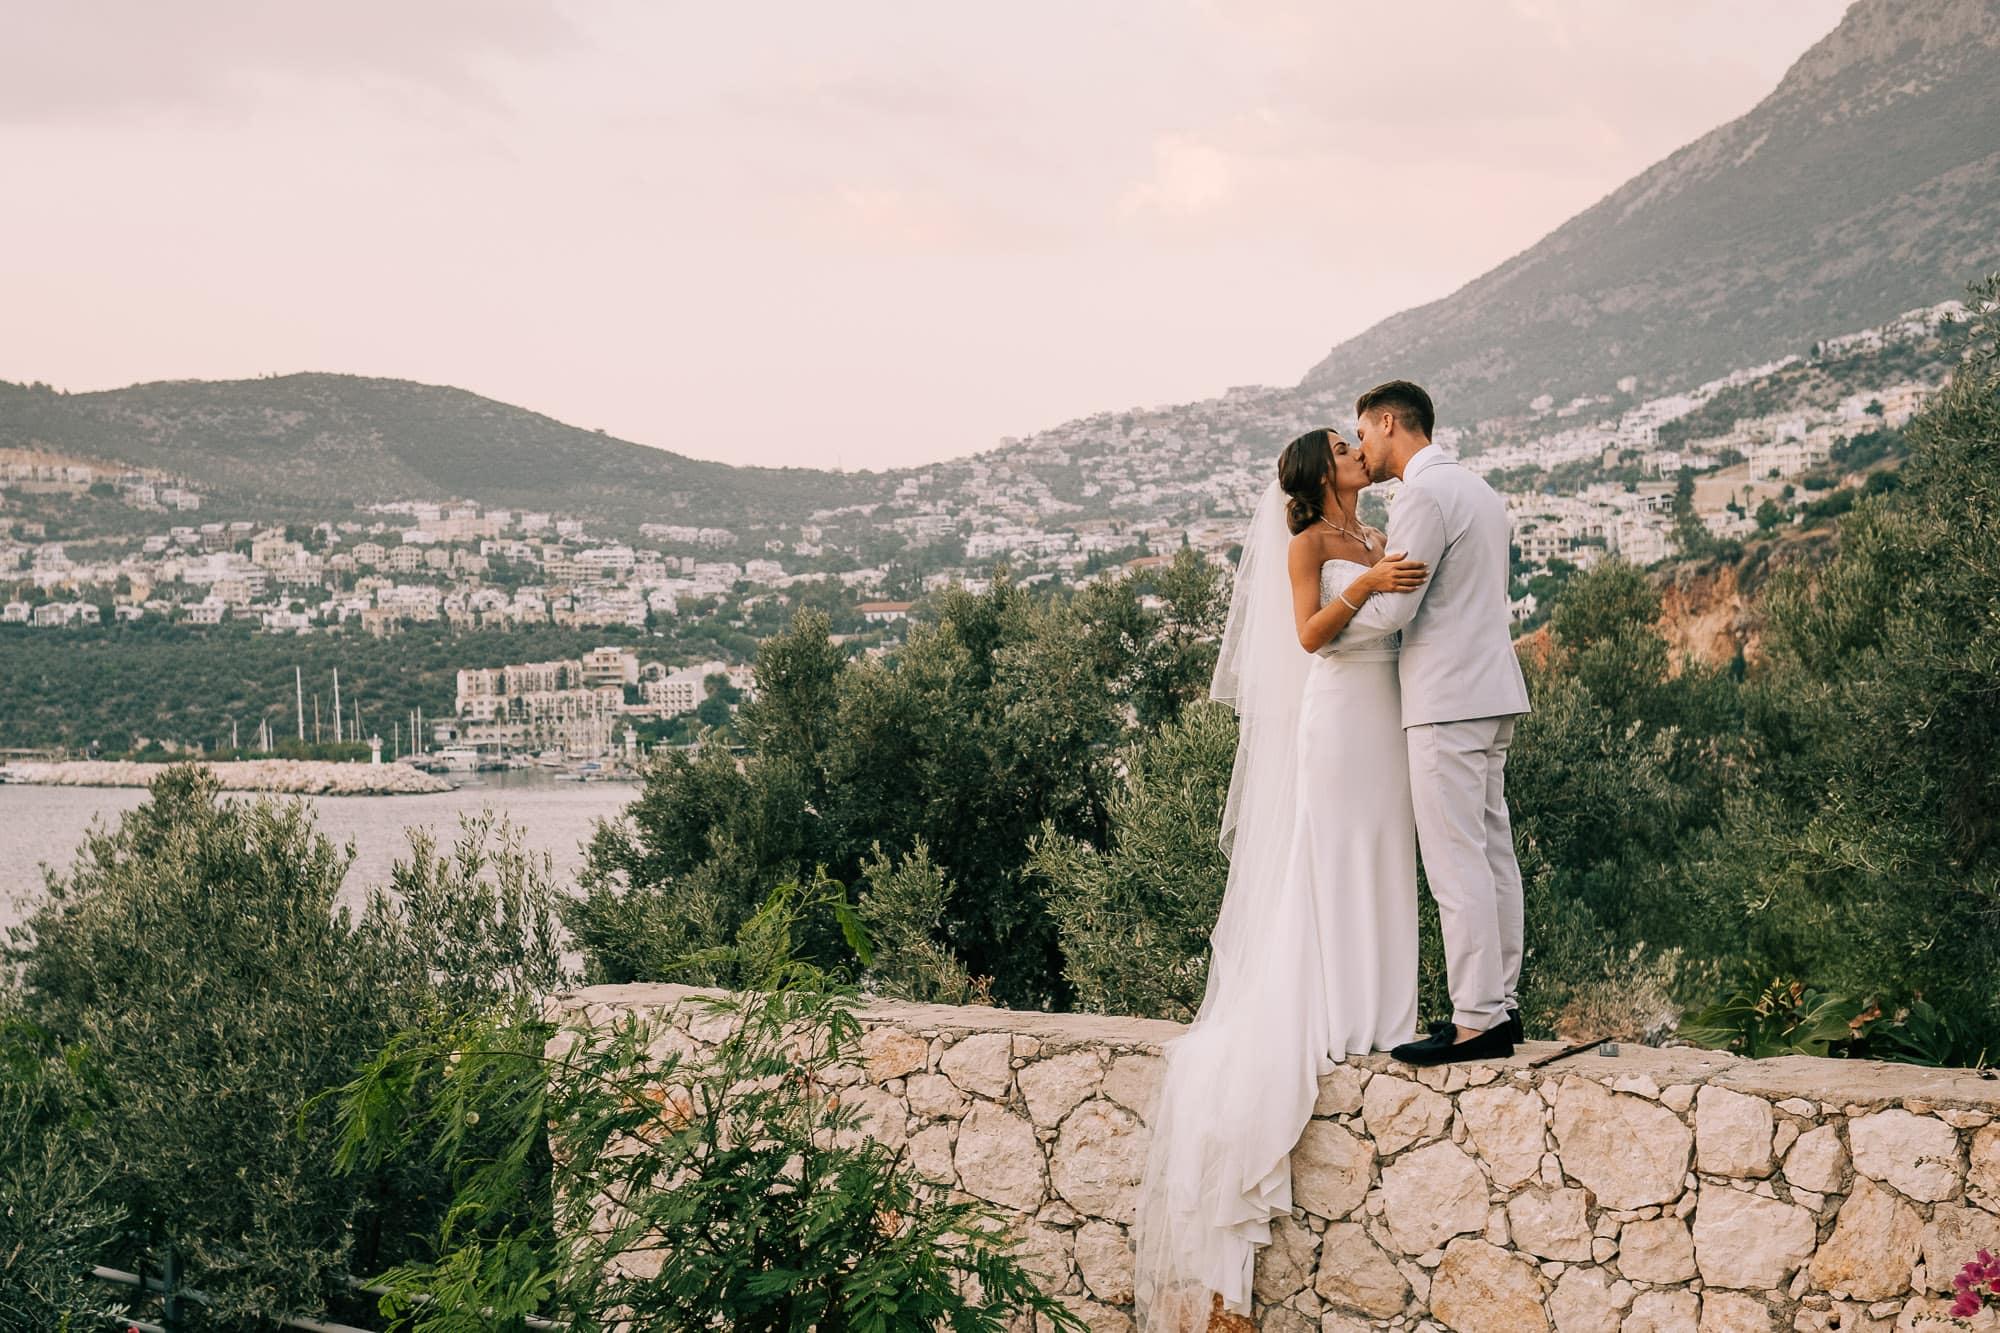 Bride and groom standing on a wall overlooking the Kalkan coastline